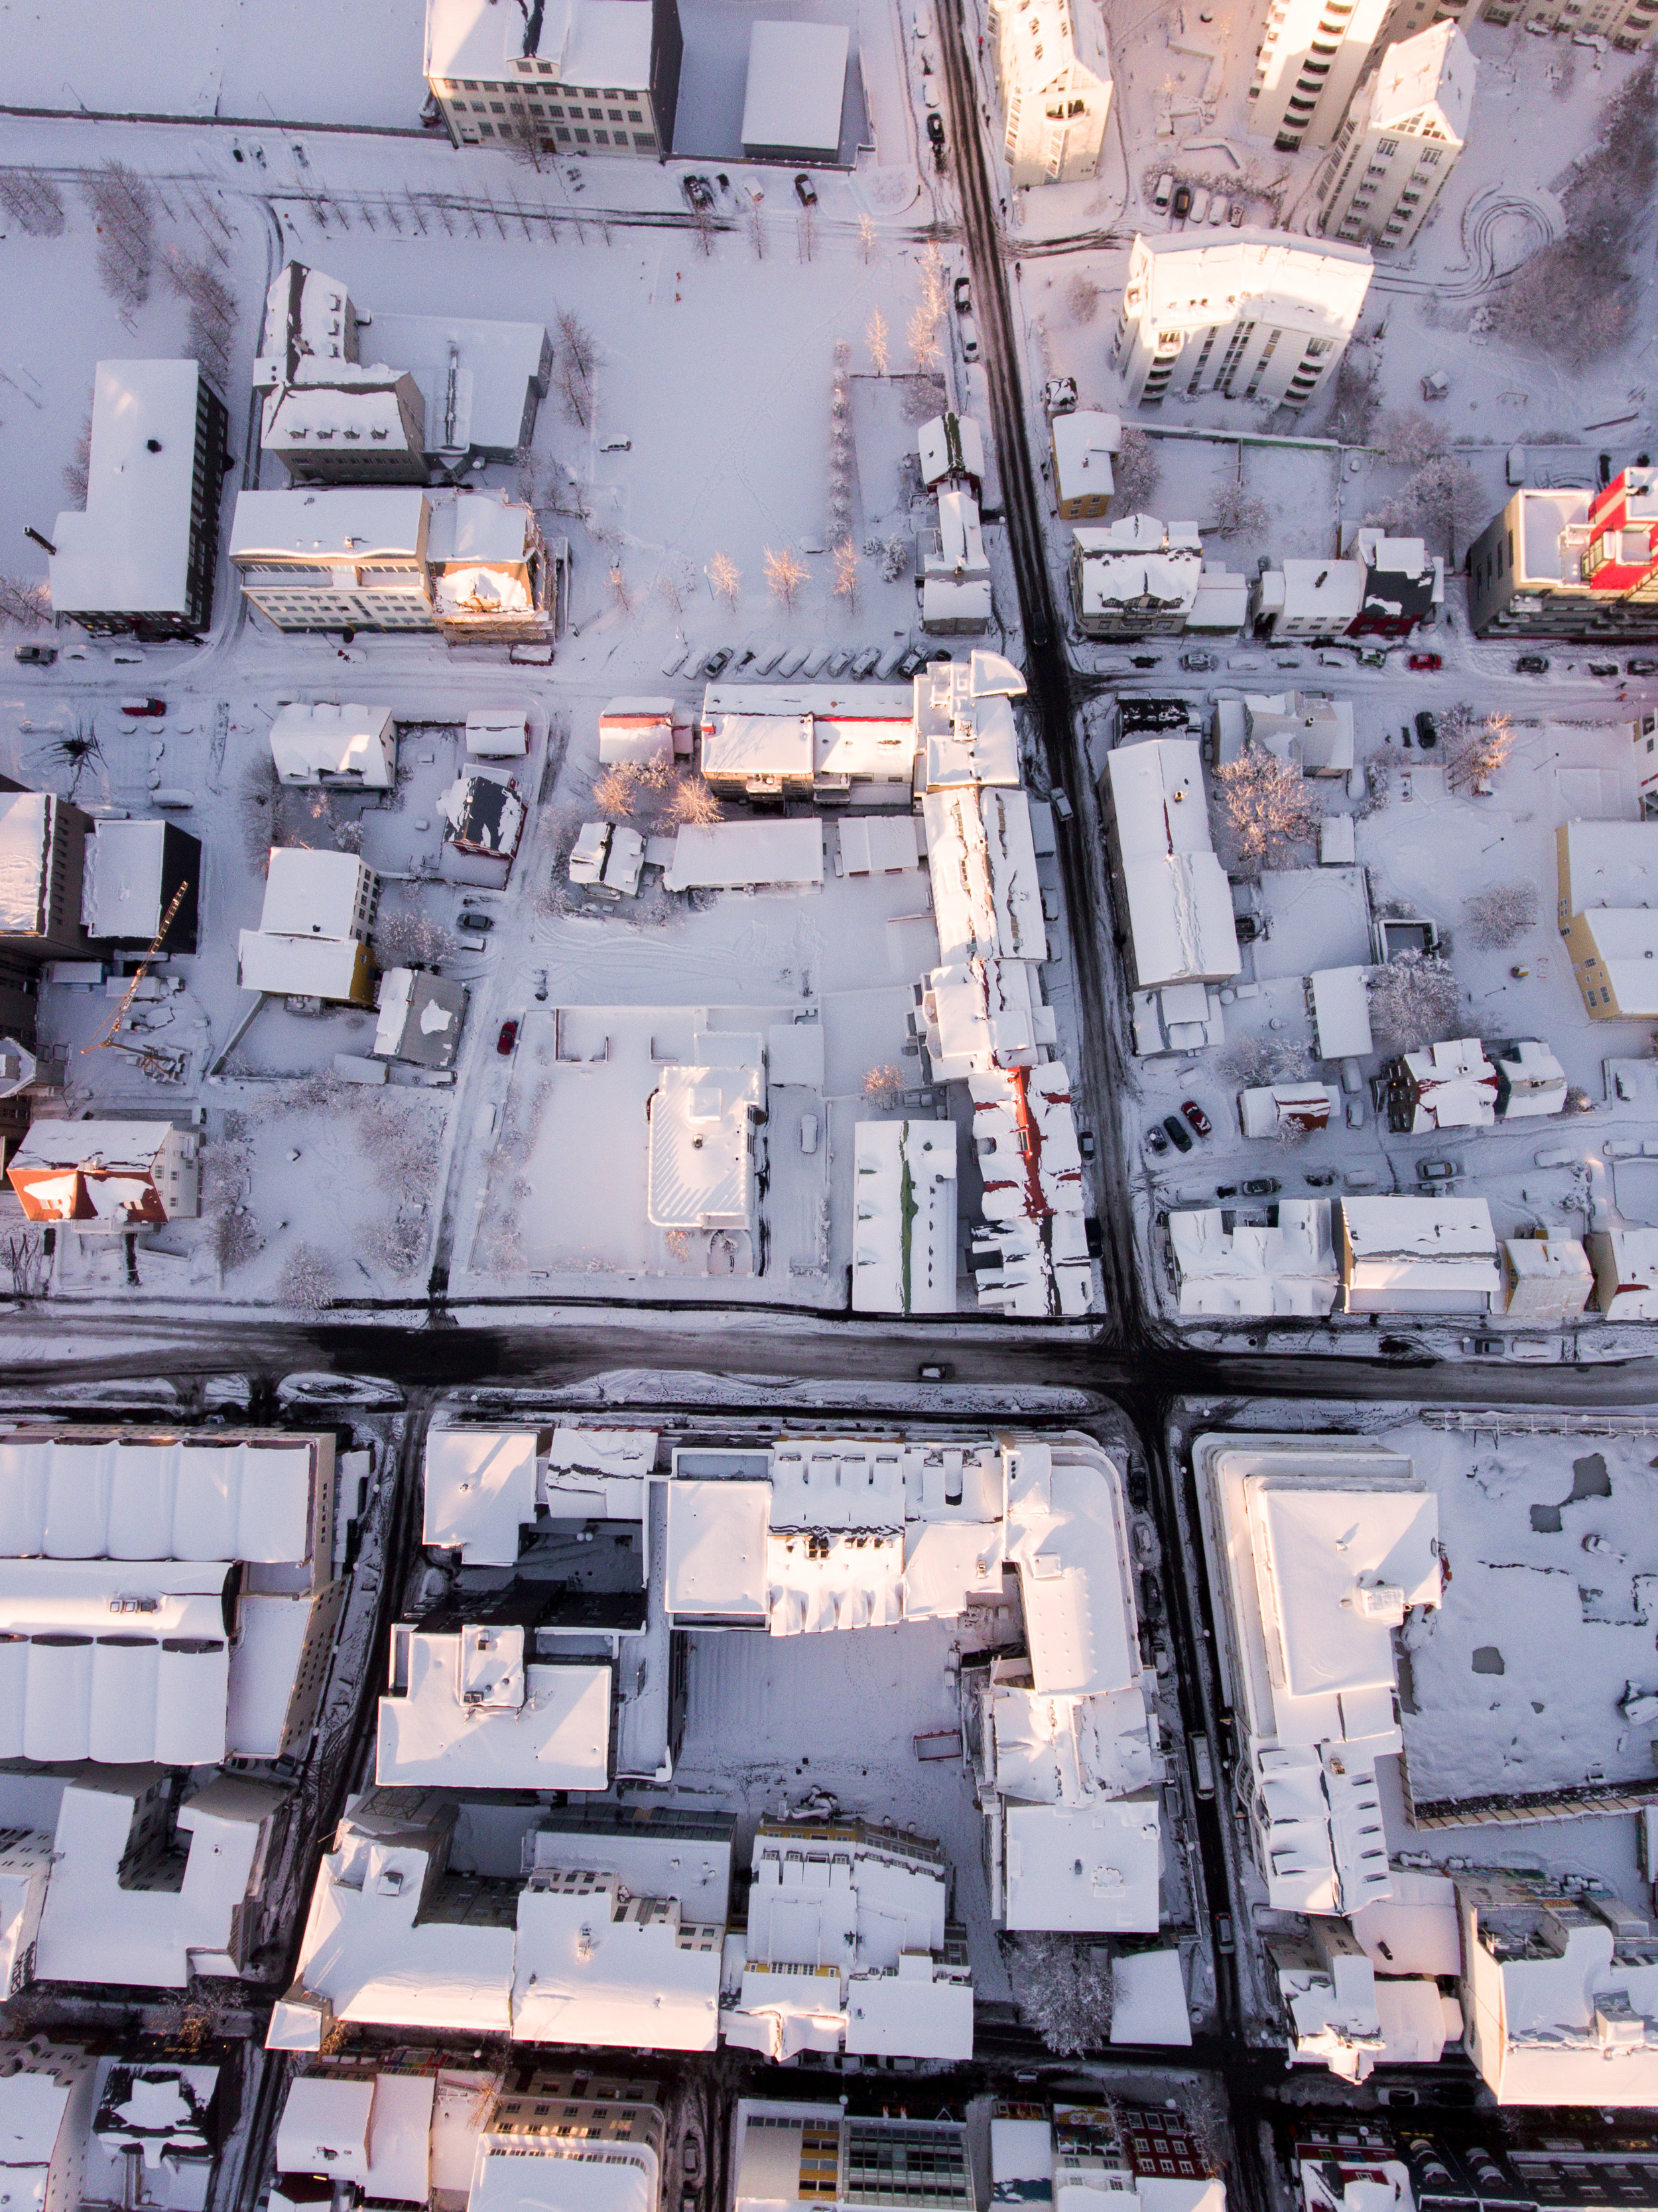 jermiah-schuster-iceland-474.jpg